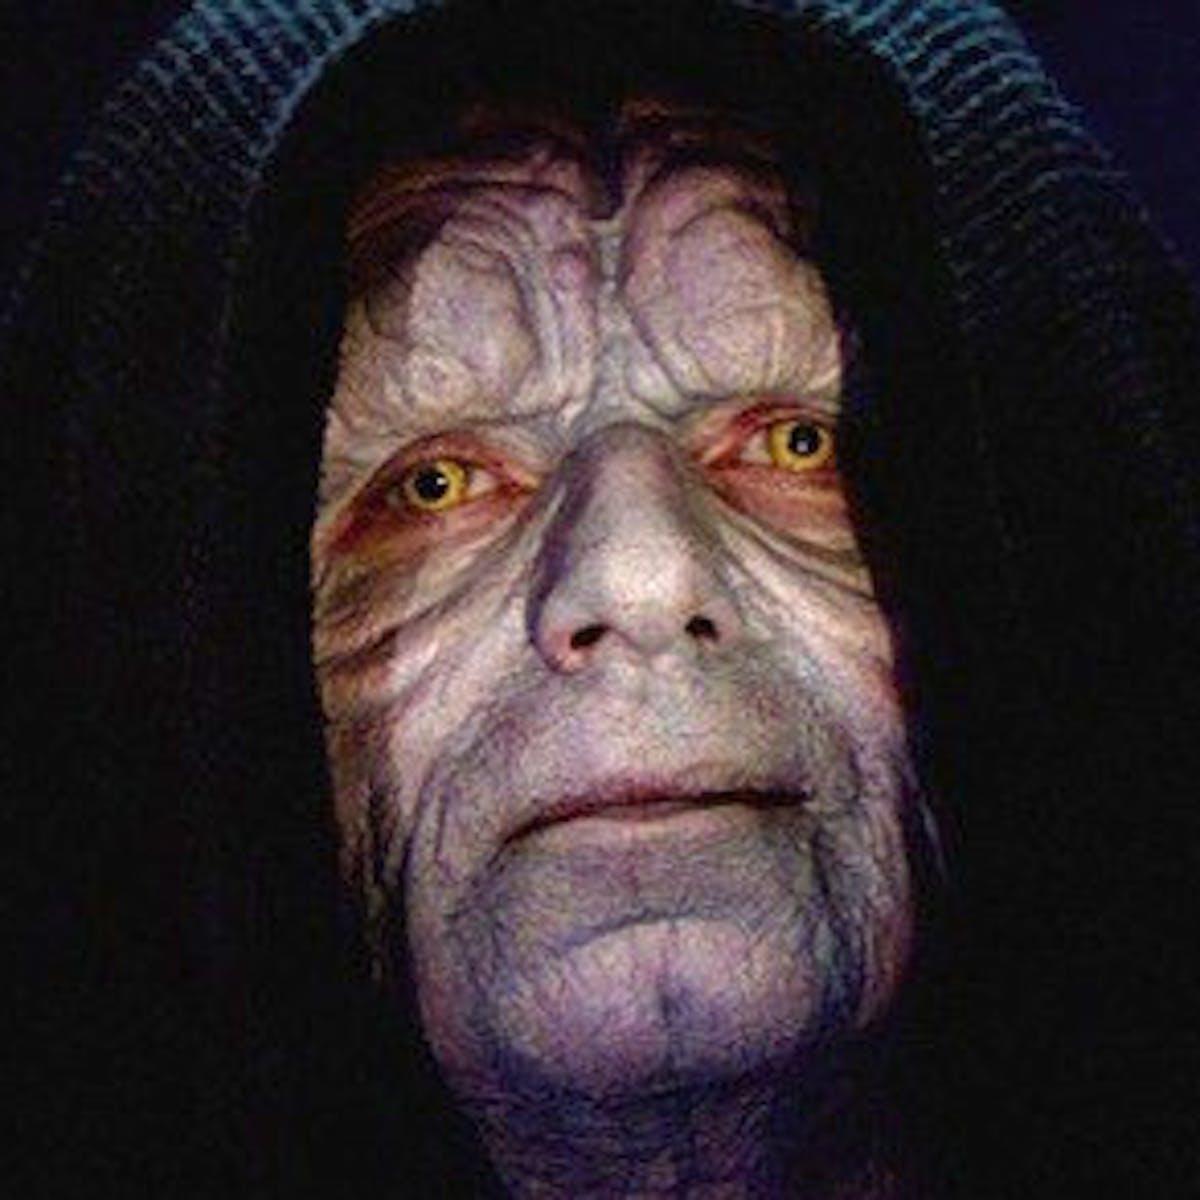 'Star Wars 9' Leaks Reveal Palpatine's Evil Plan to Resurrect Himself